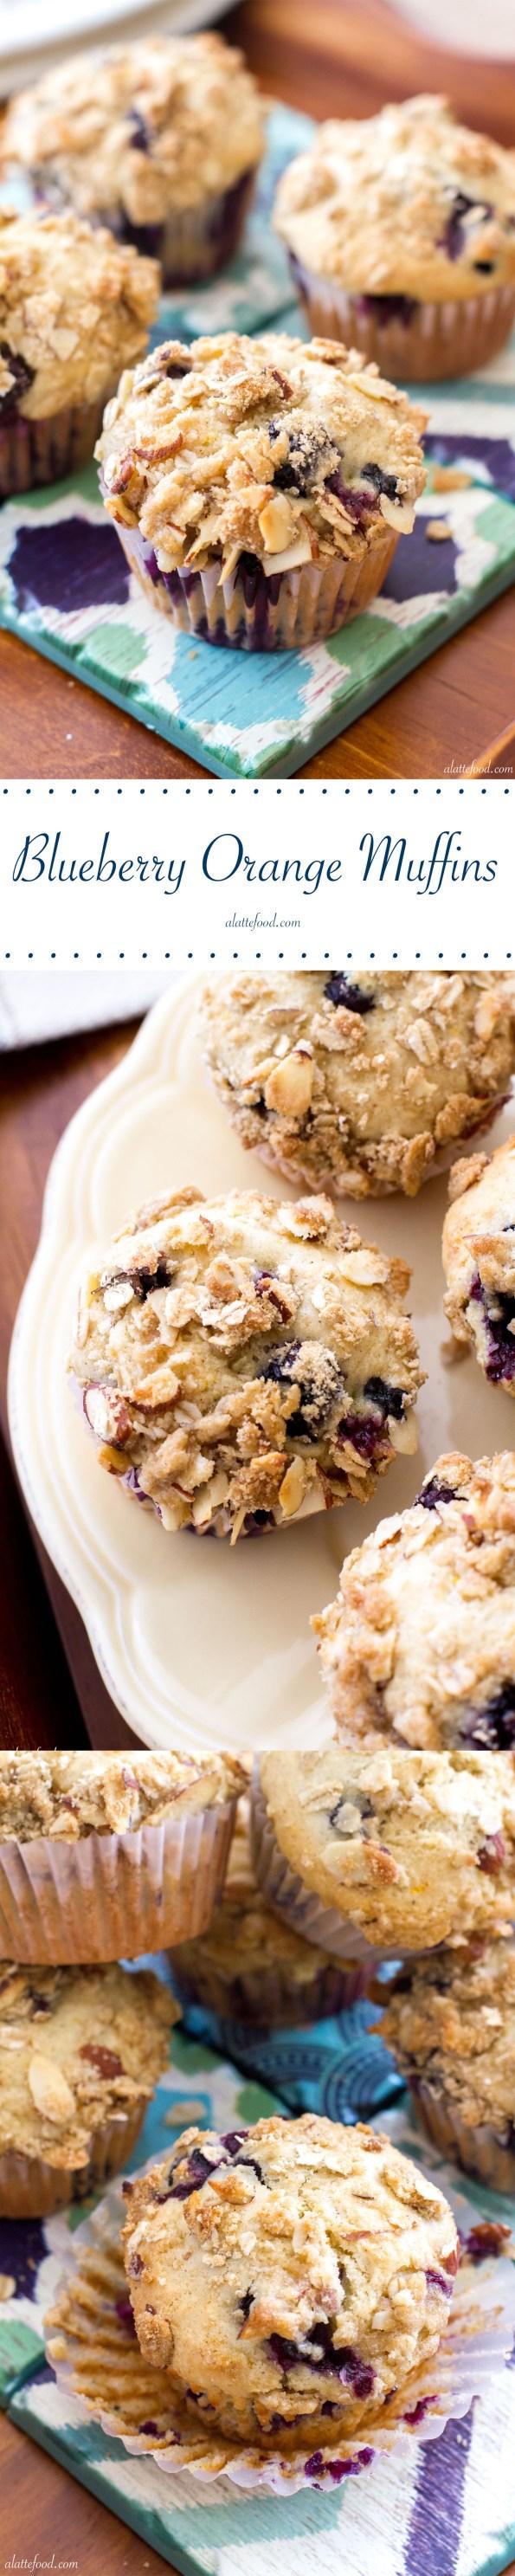 Blueberry Orange Crumb Muffins | A Latte Food